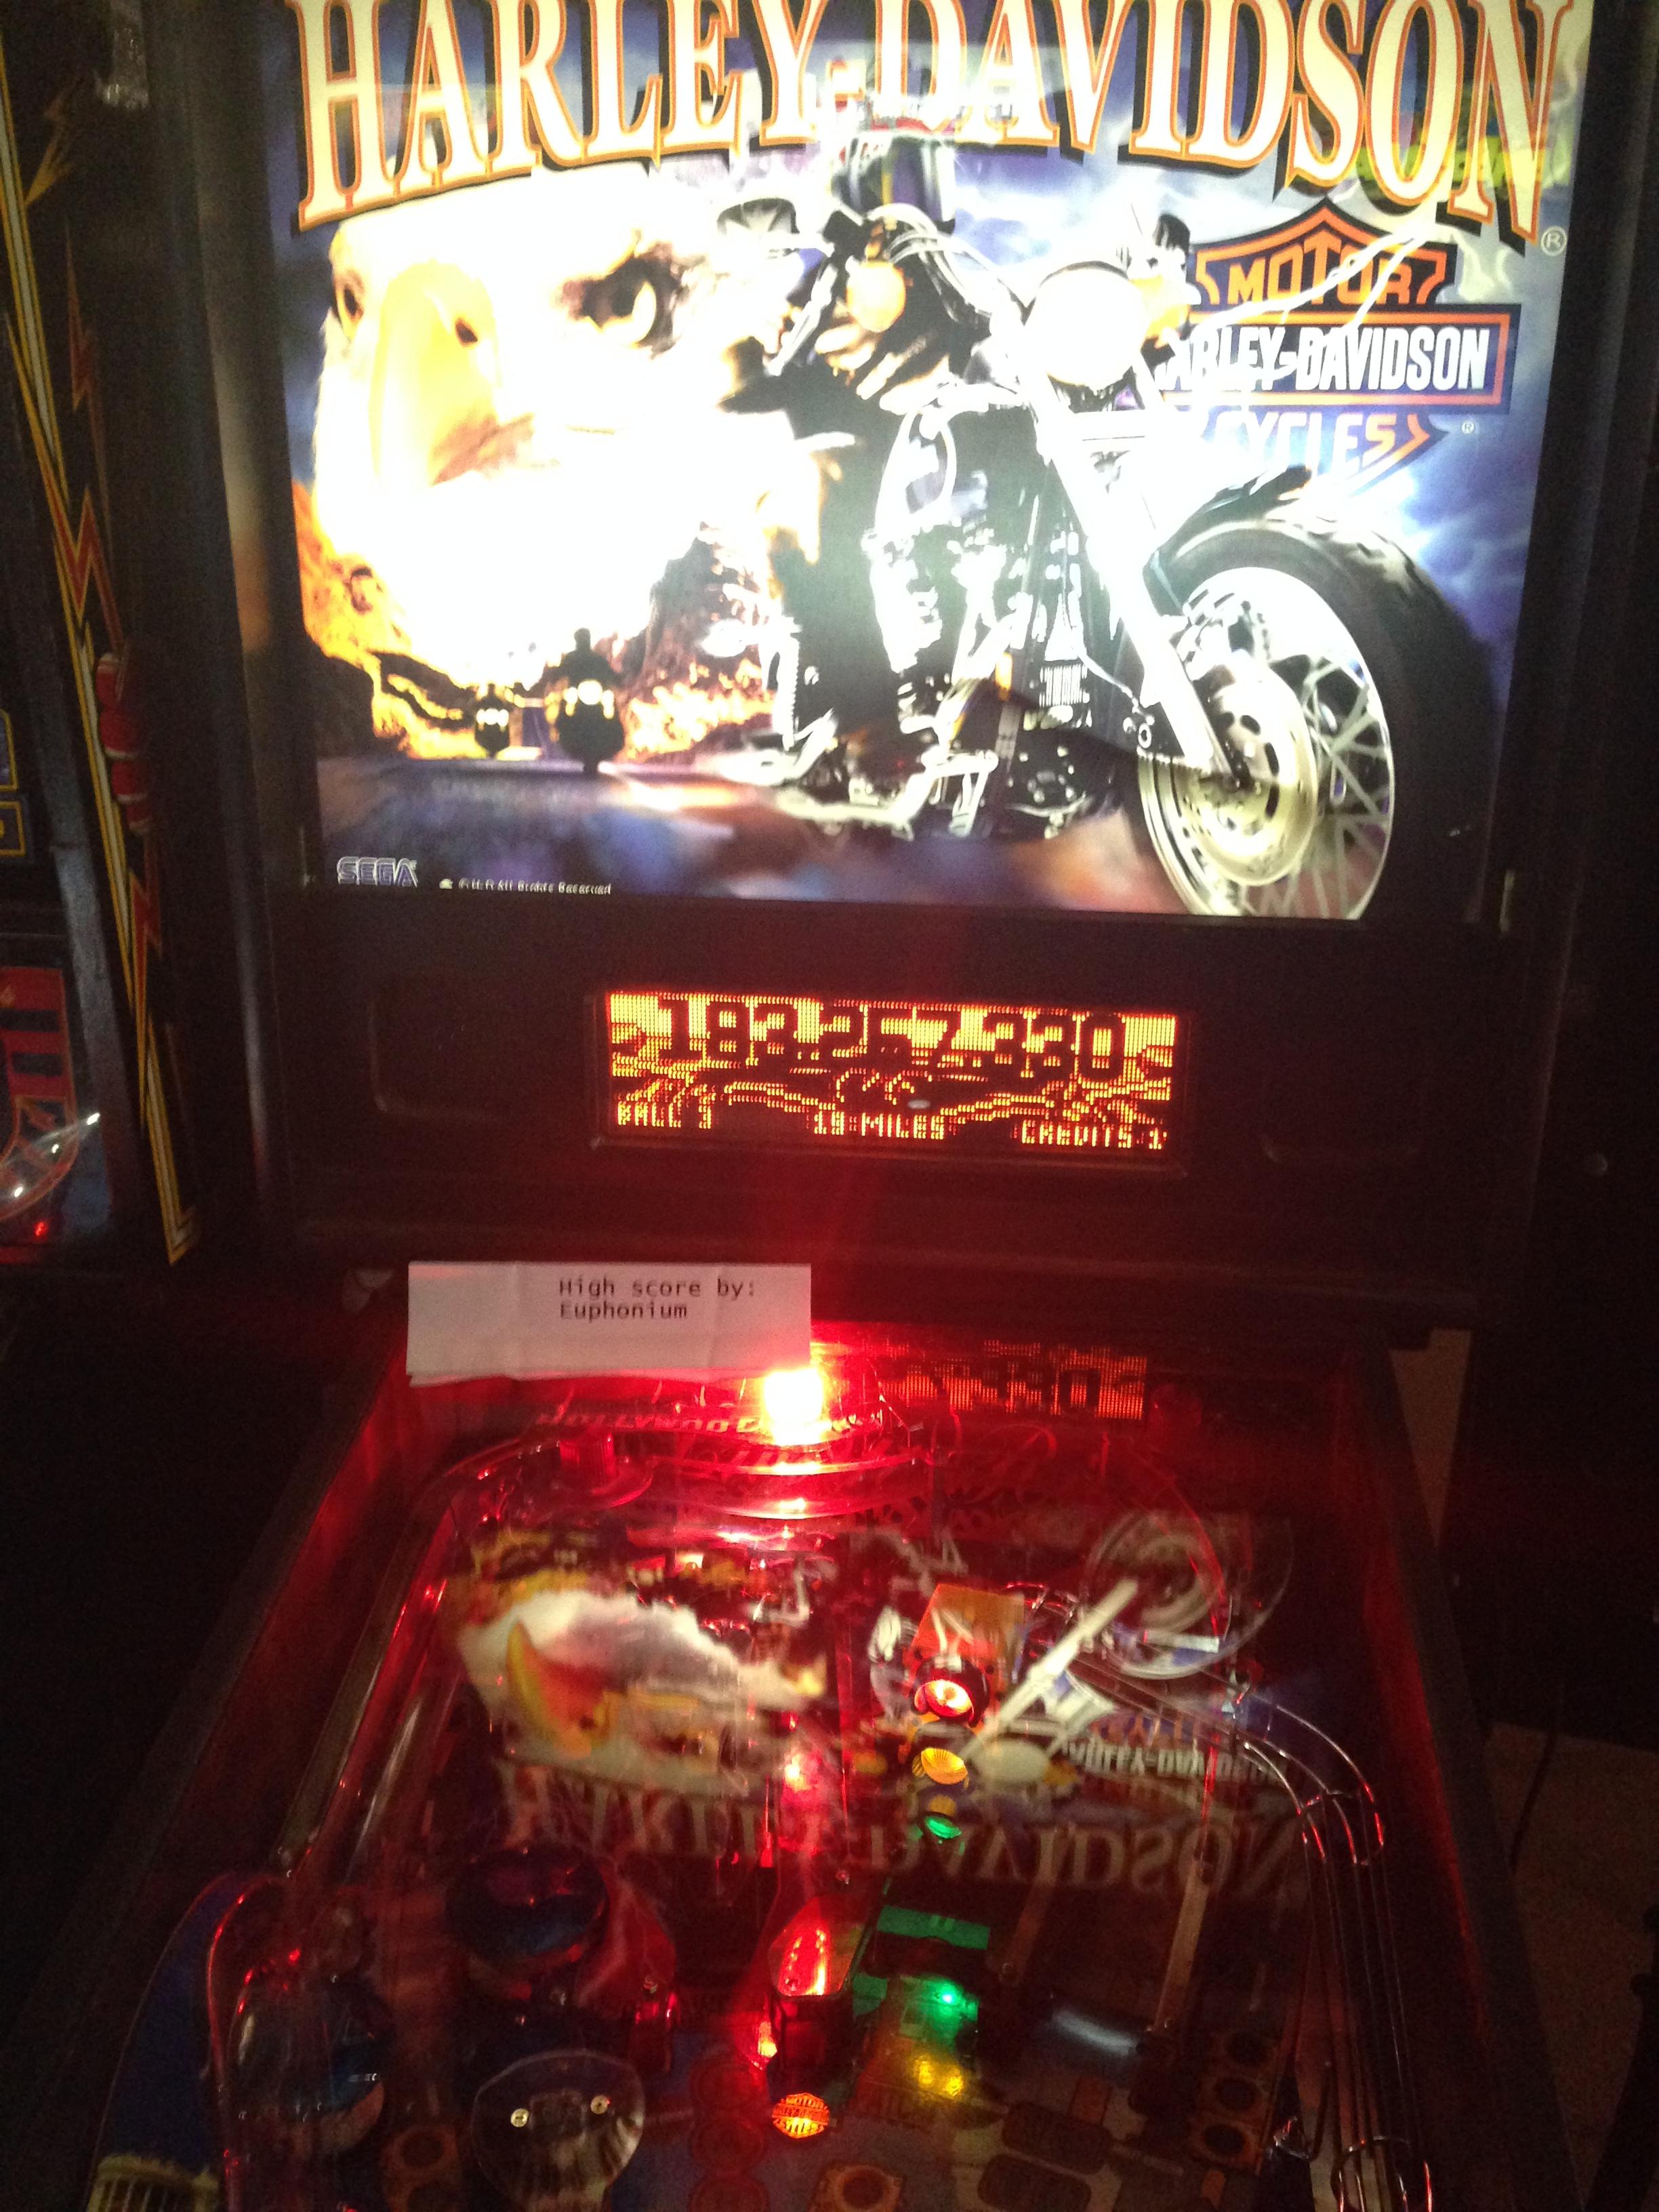 euphonium: Harley Davidson (Sega/Stern) (Pinball: 3 Balls) 193,257,330 points on 2016-09-21 09:48:25